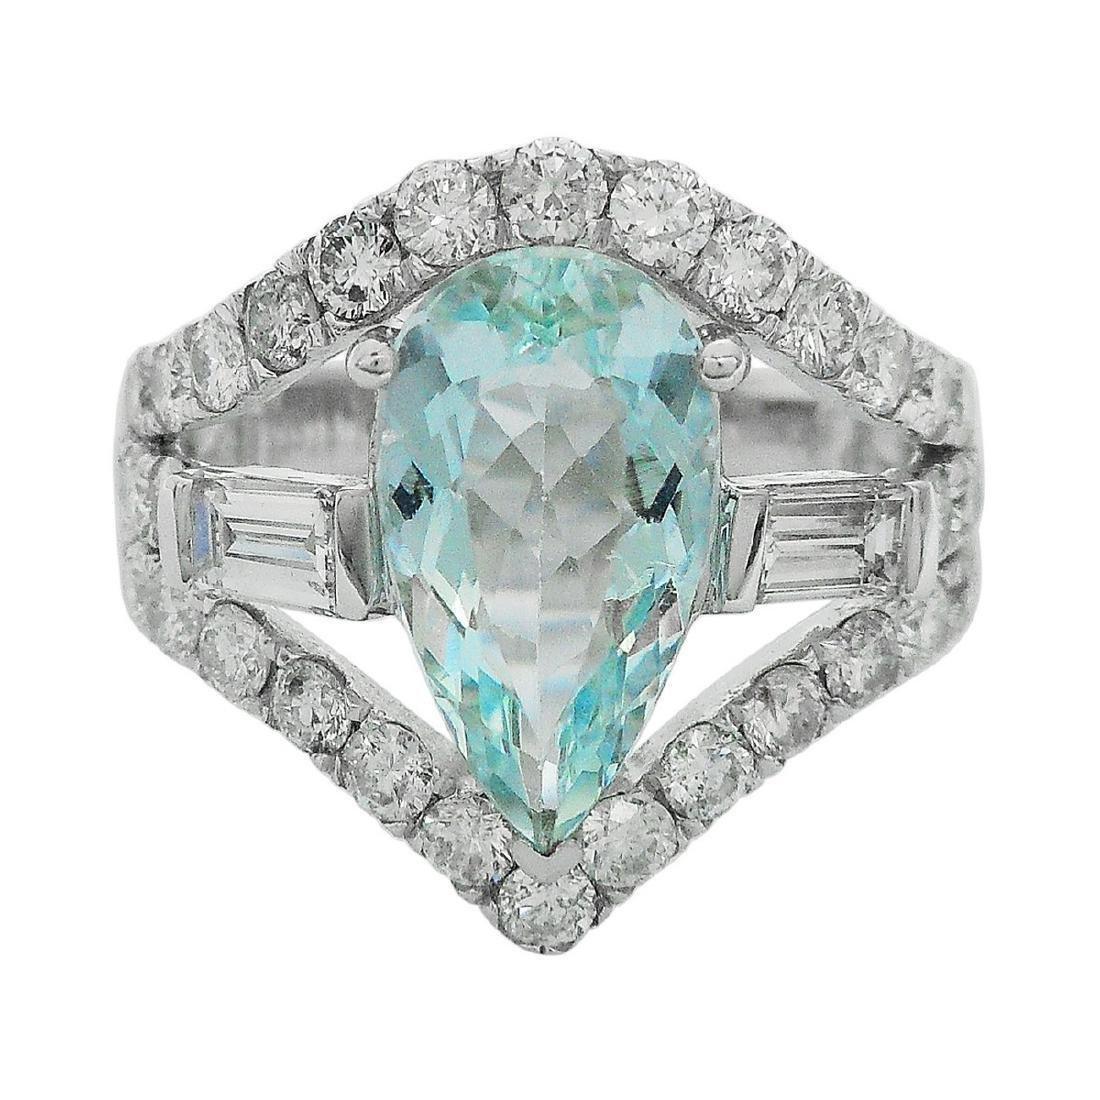 14K White Gold 1.87ct Aquamarine 1.51ctw Diamond Ring